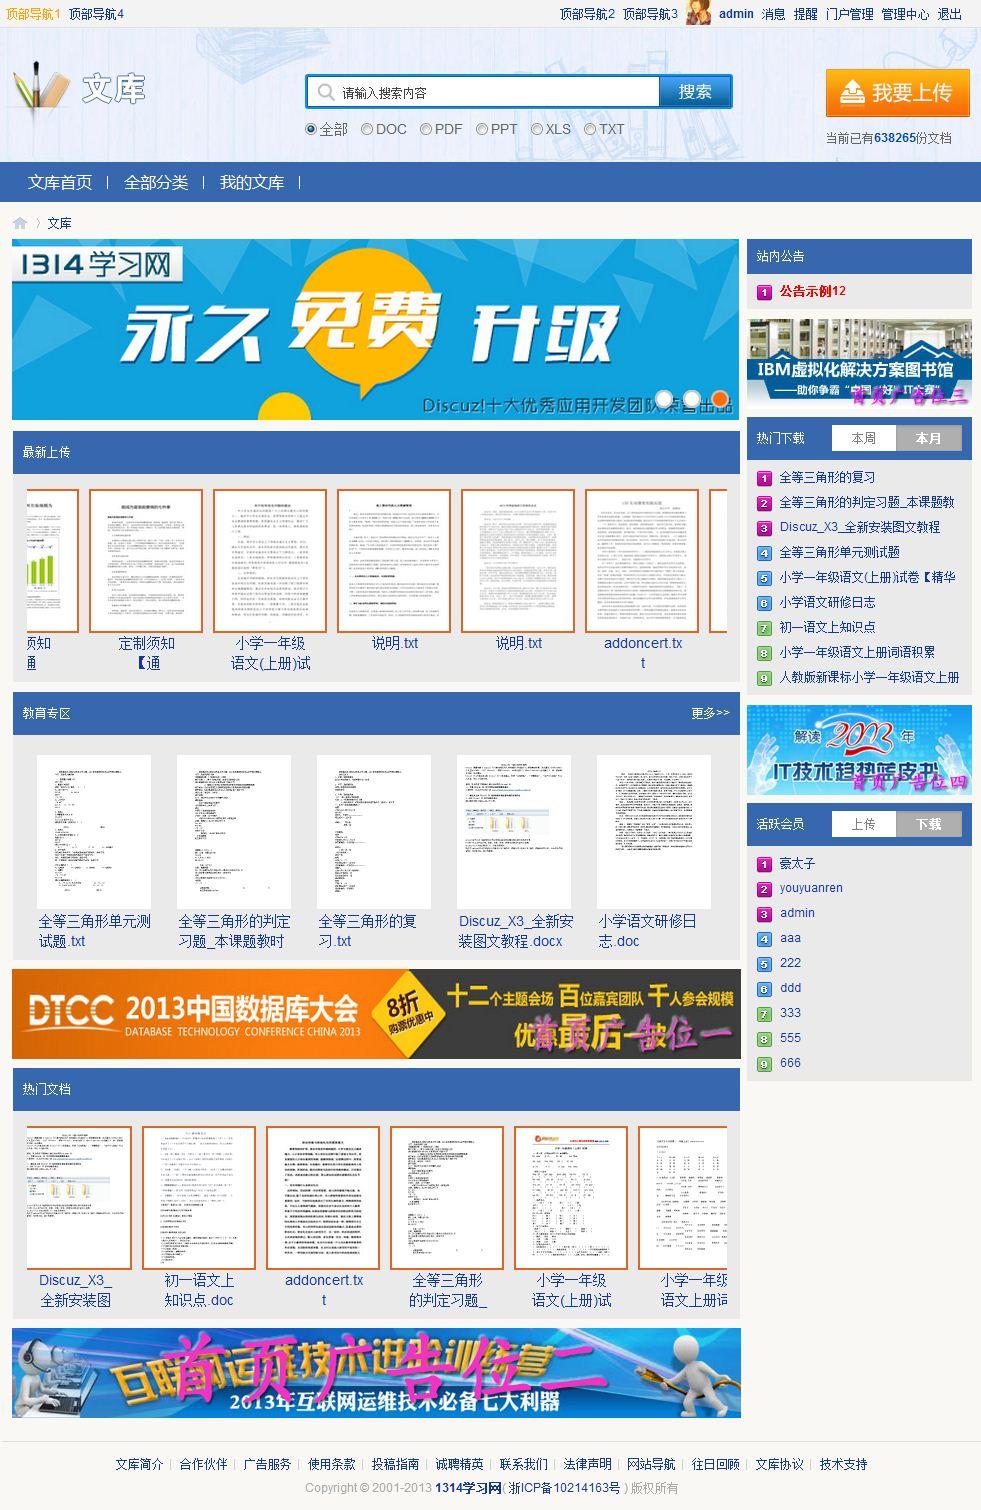 Discuz插件[1314]文库管理系统 1.1.0【修复版】 商业版dz插件在线分享文档的开放共享平台功能等